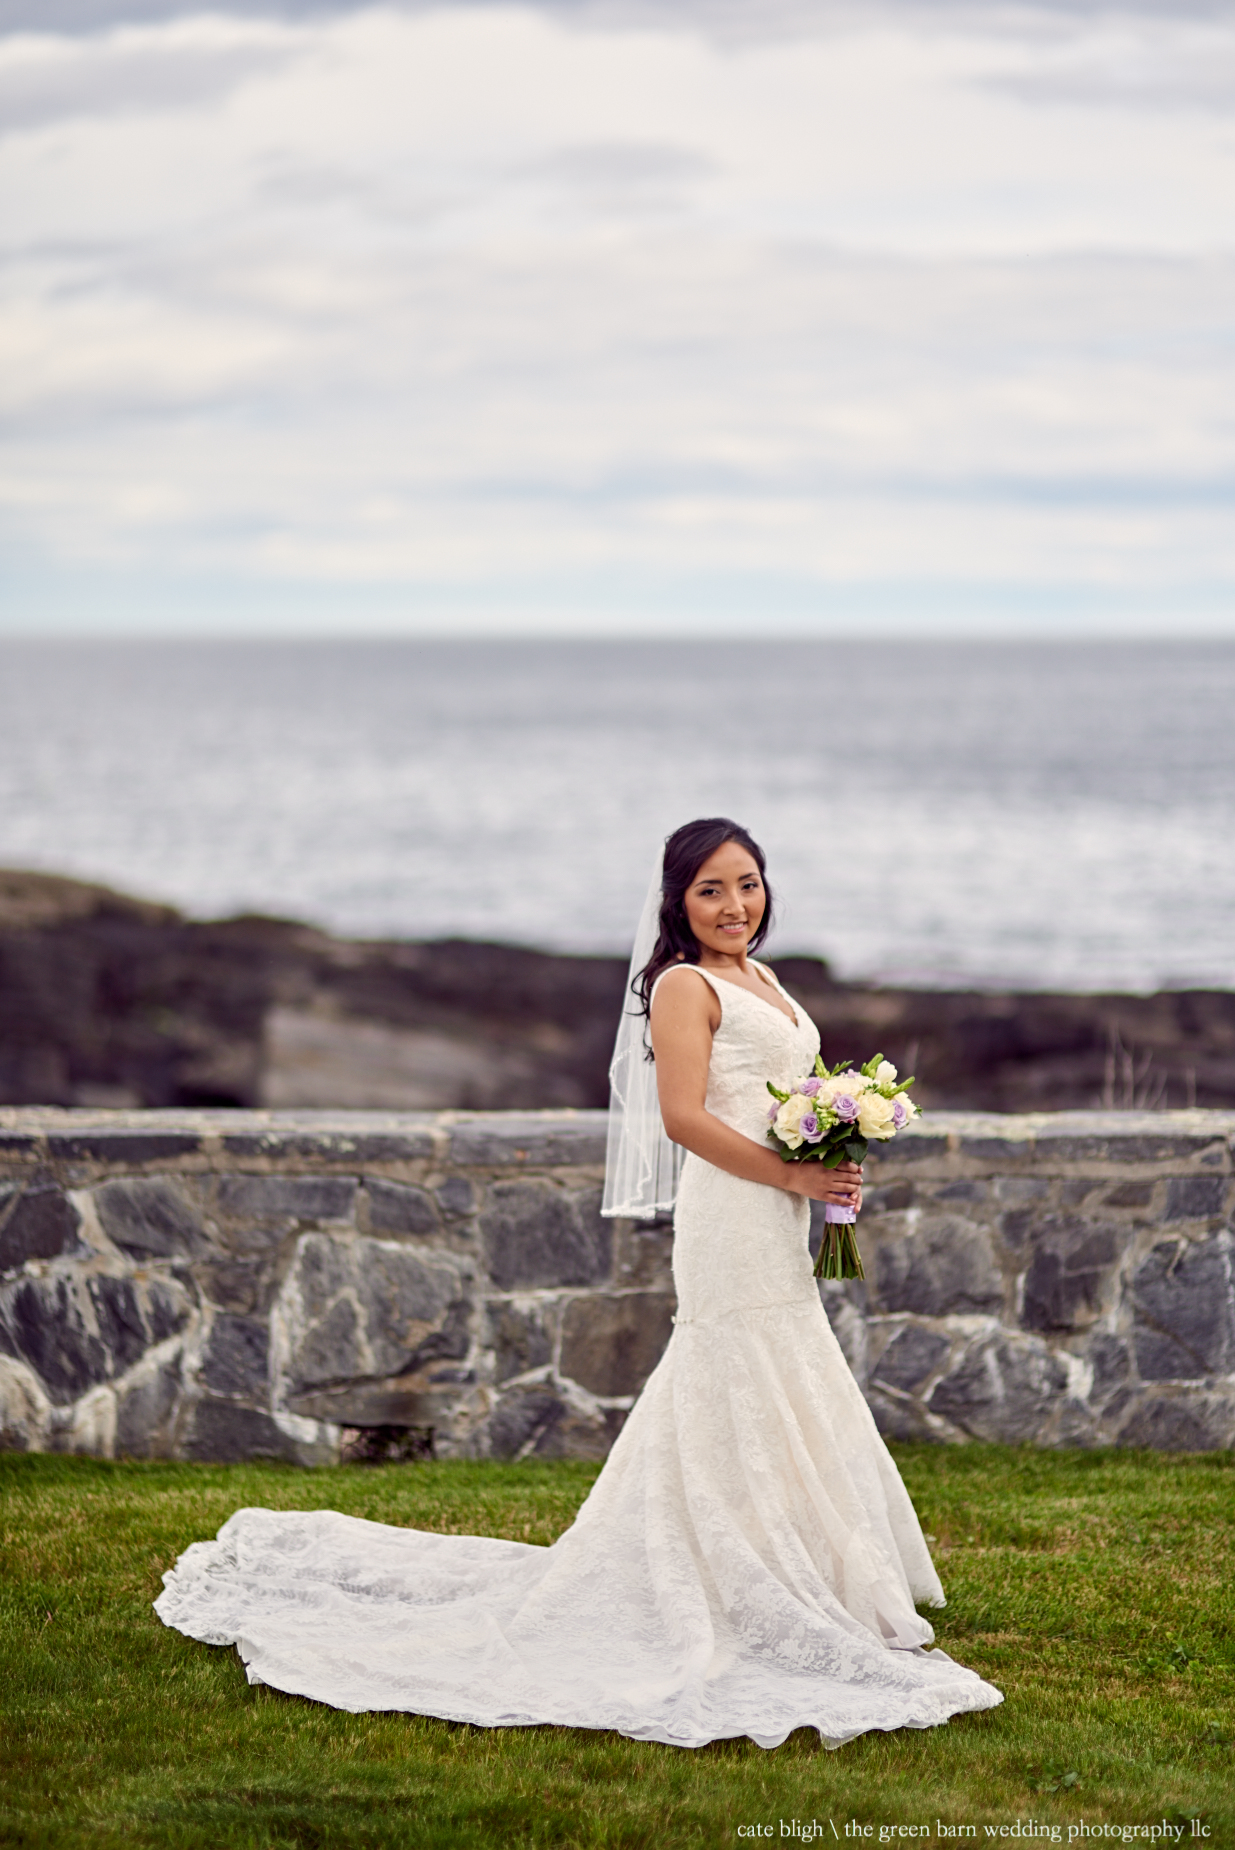 Stunning bridal portrait at Cape Elizabeth, ME